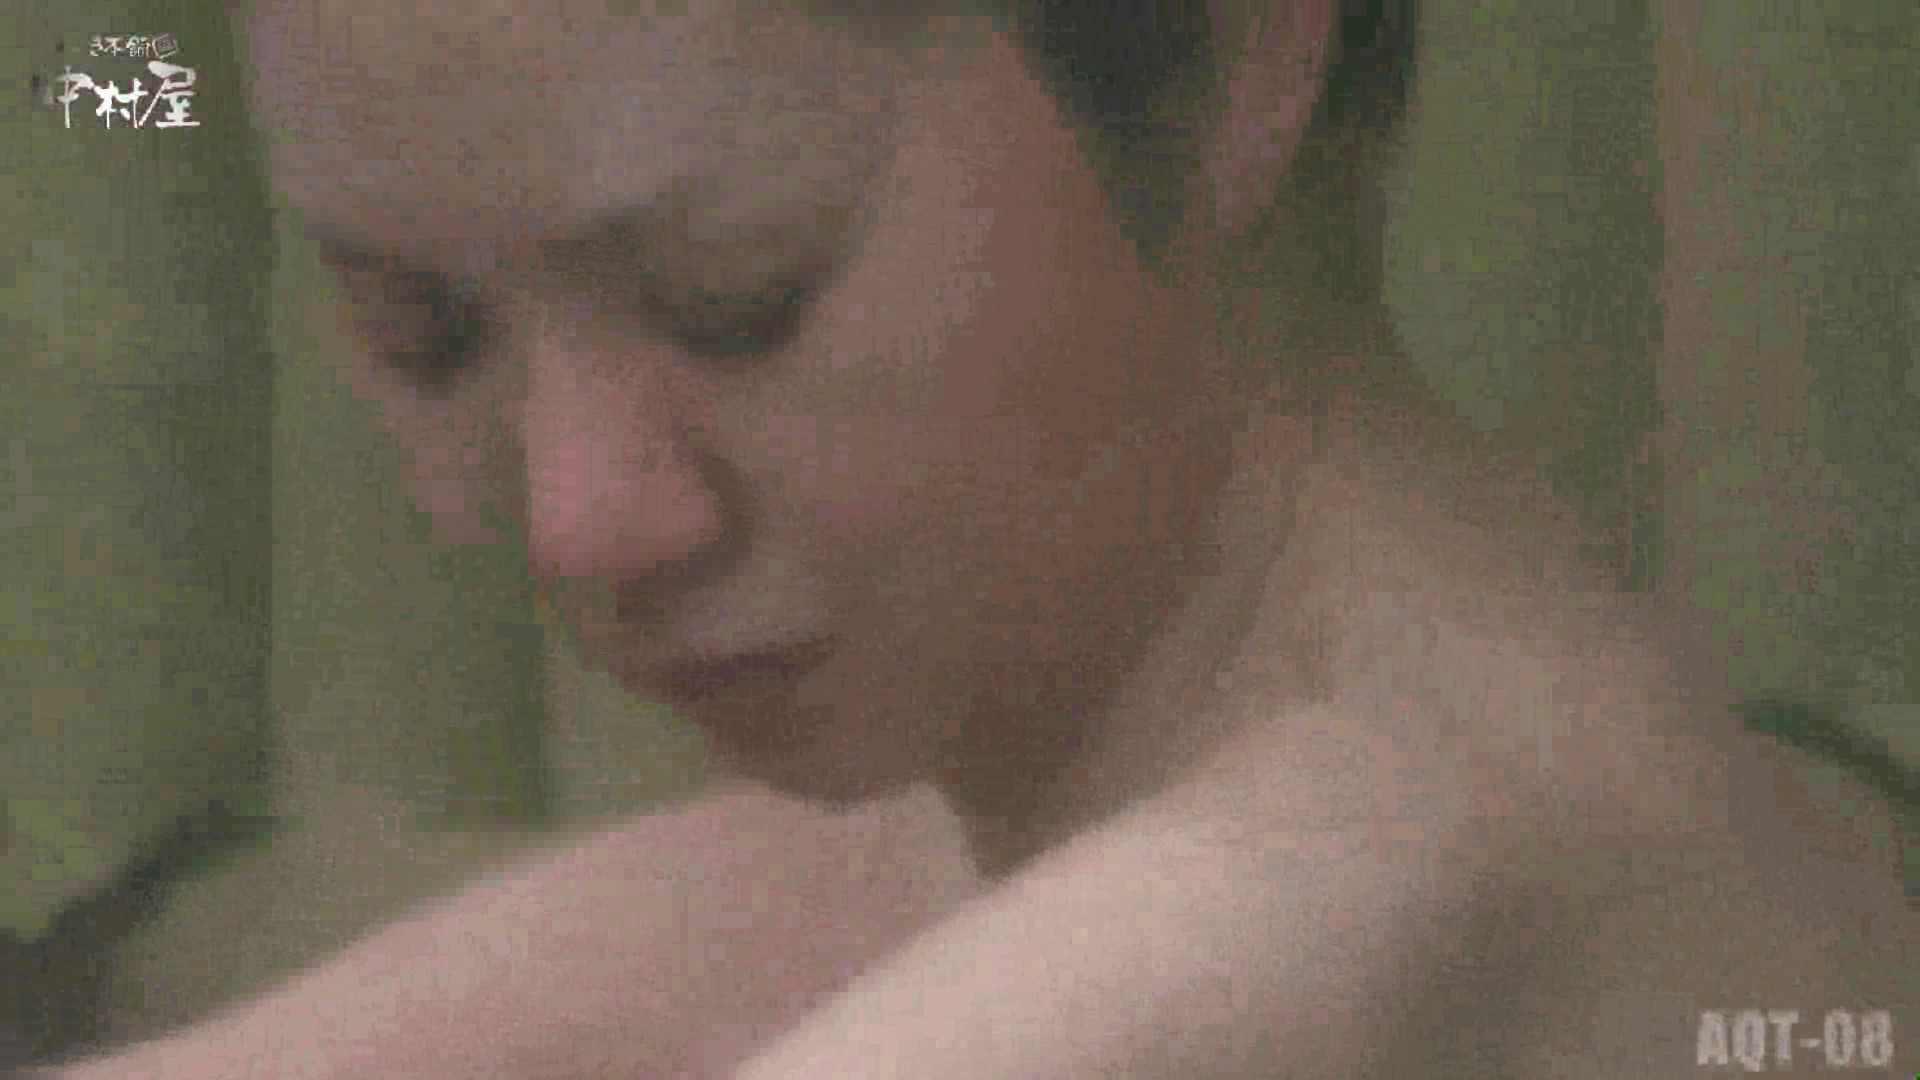 Aquaな露天風呂Vol.872潜入盗撮露天風呂八判湯 其の一 露天 おめこ無修正動画無料 89pic 11